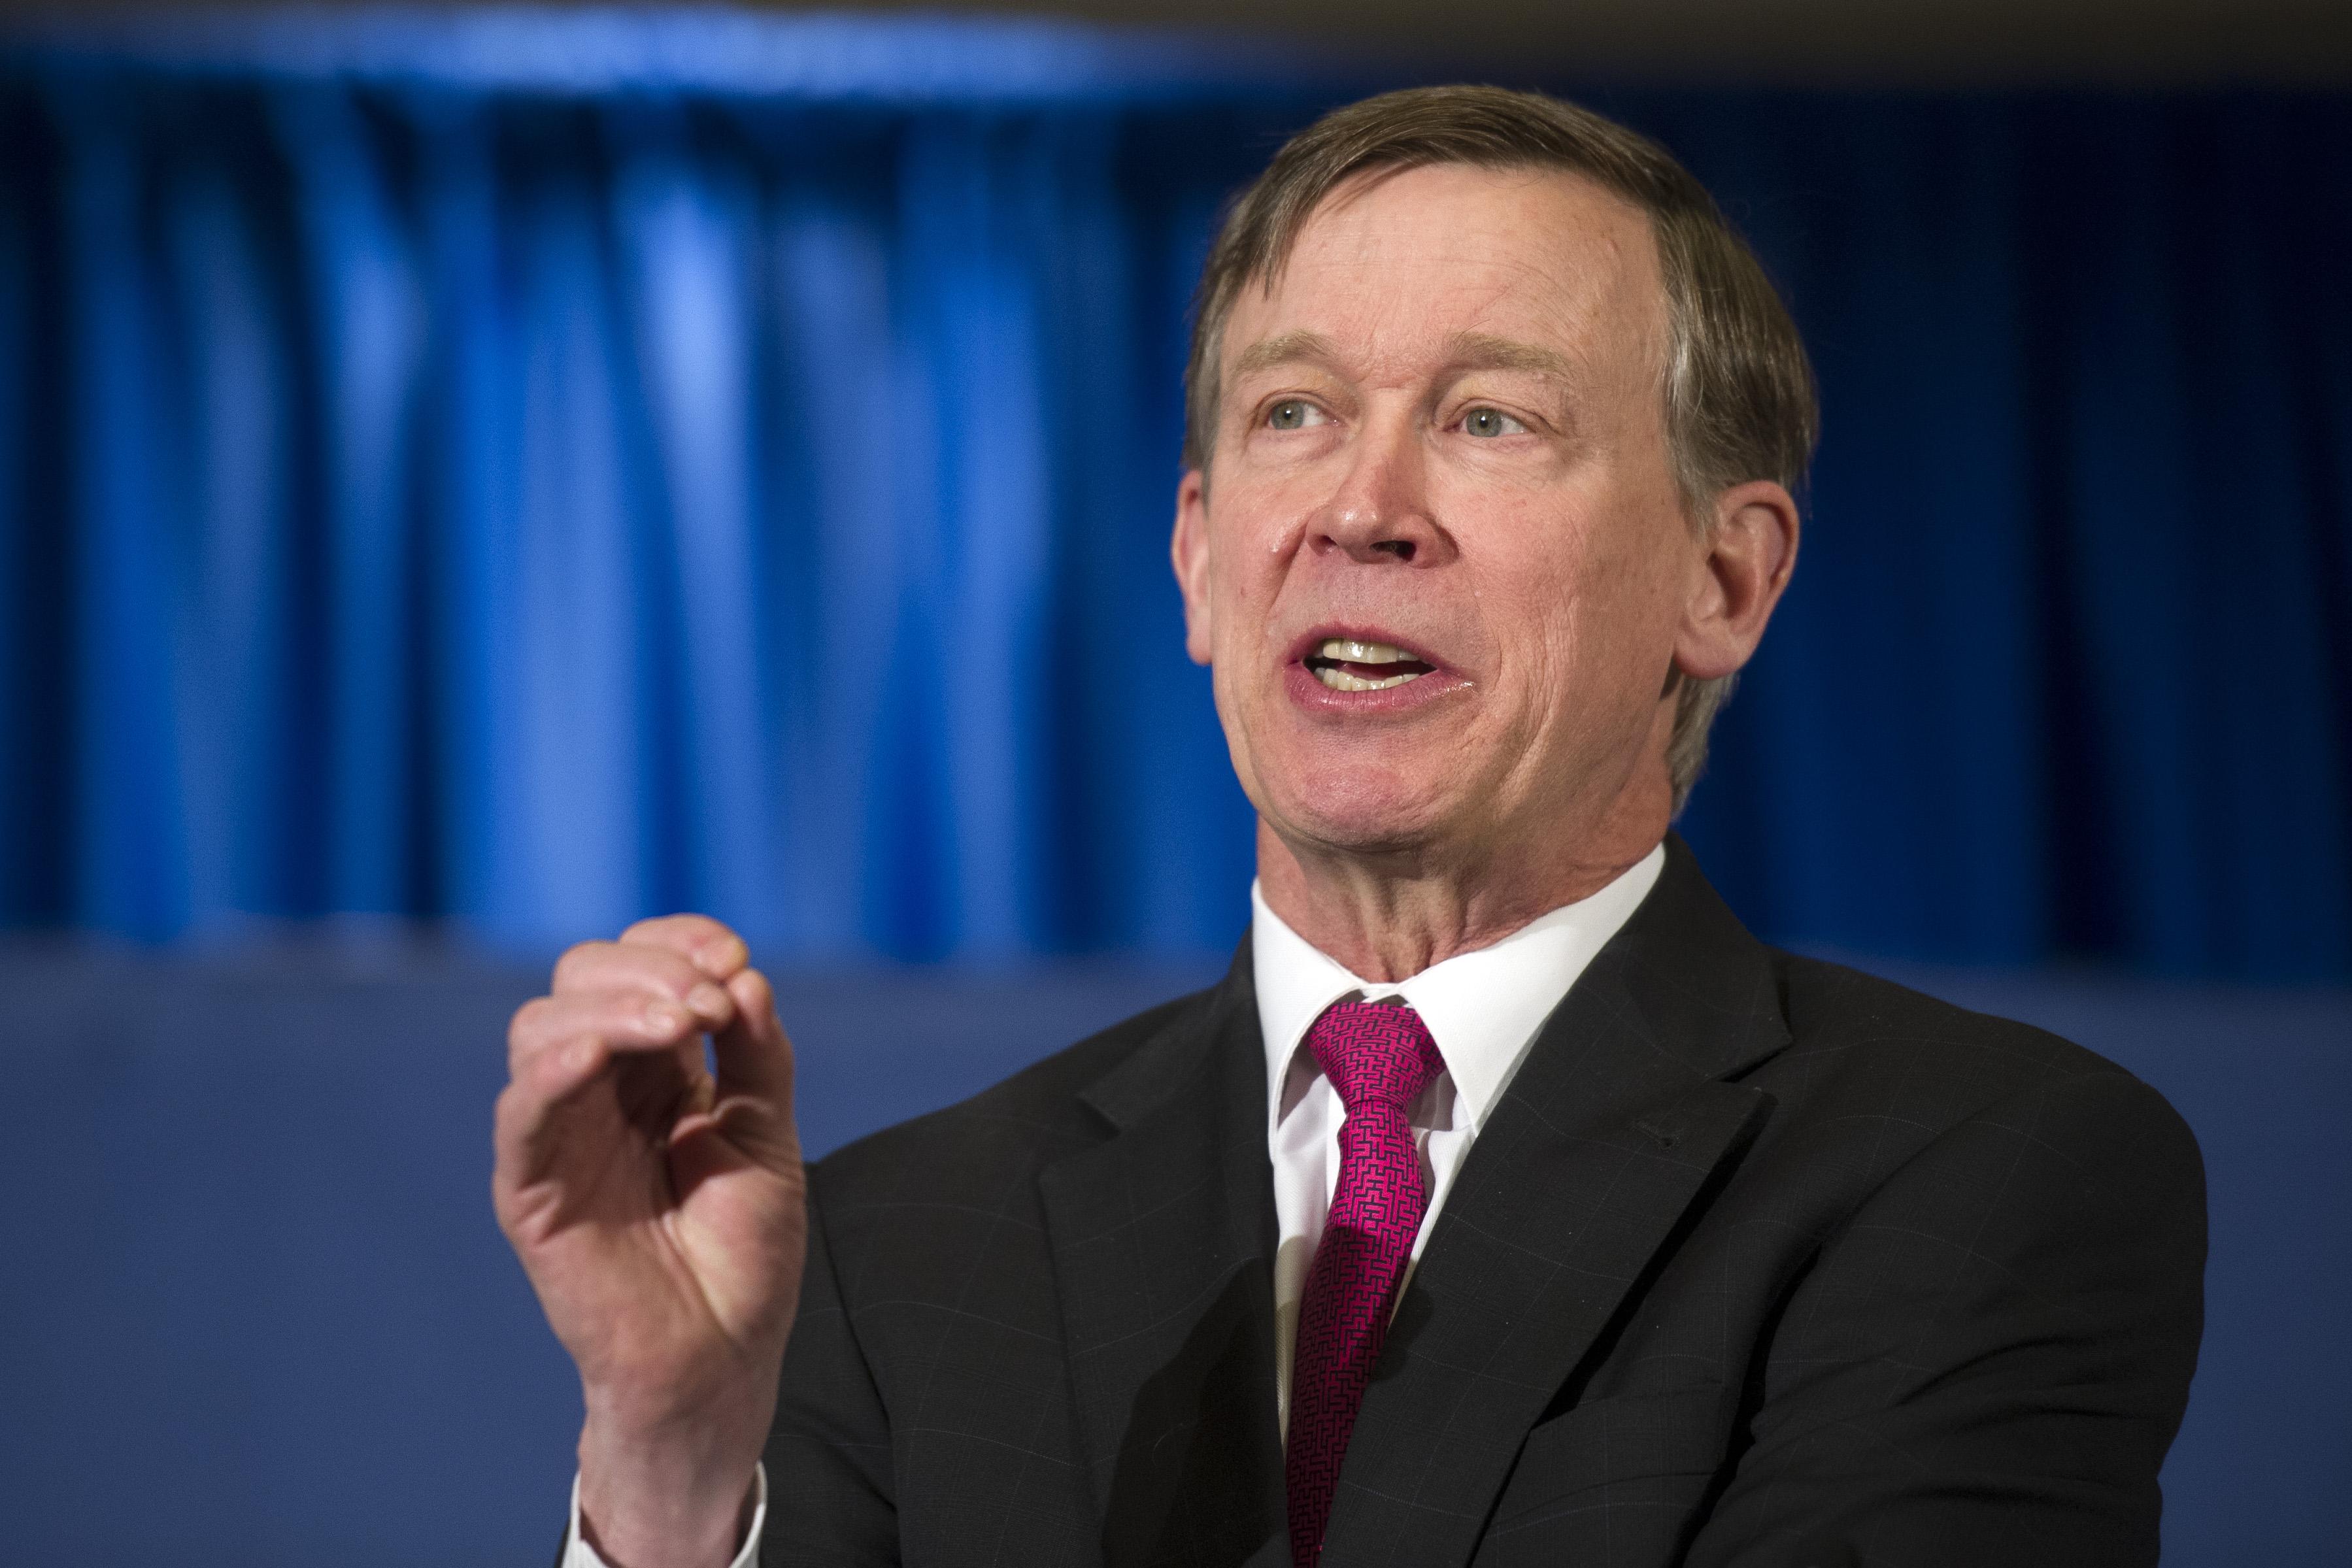 Photo: John Hickenlooper in Washington (AP Photo)